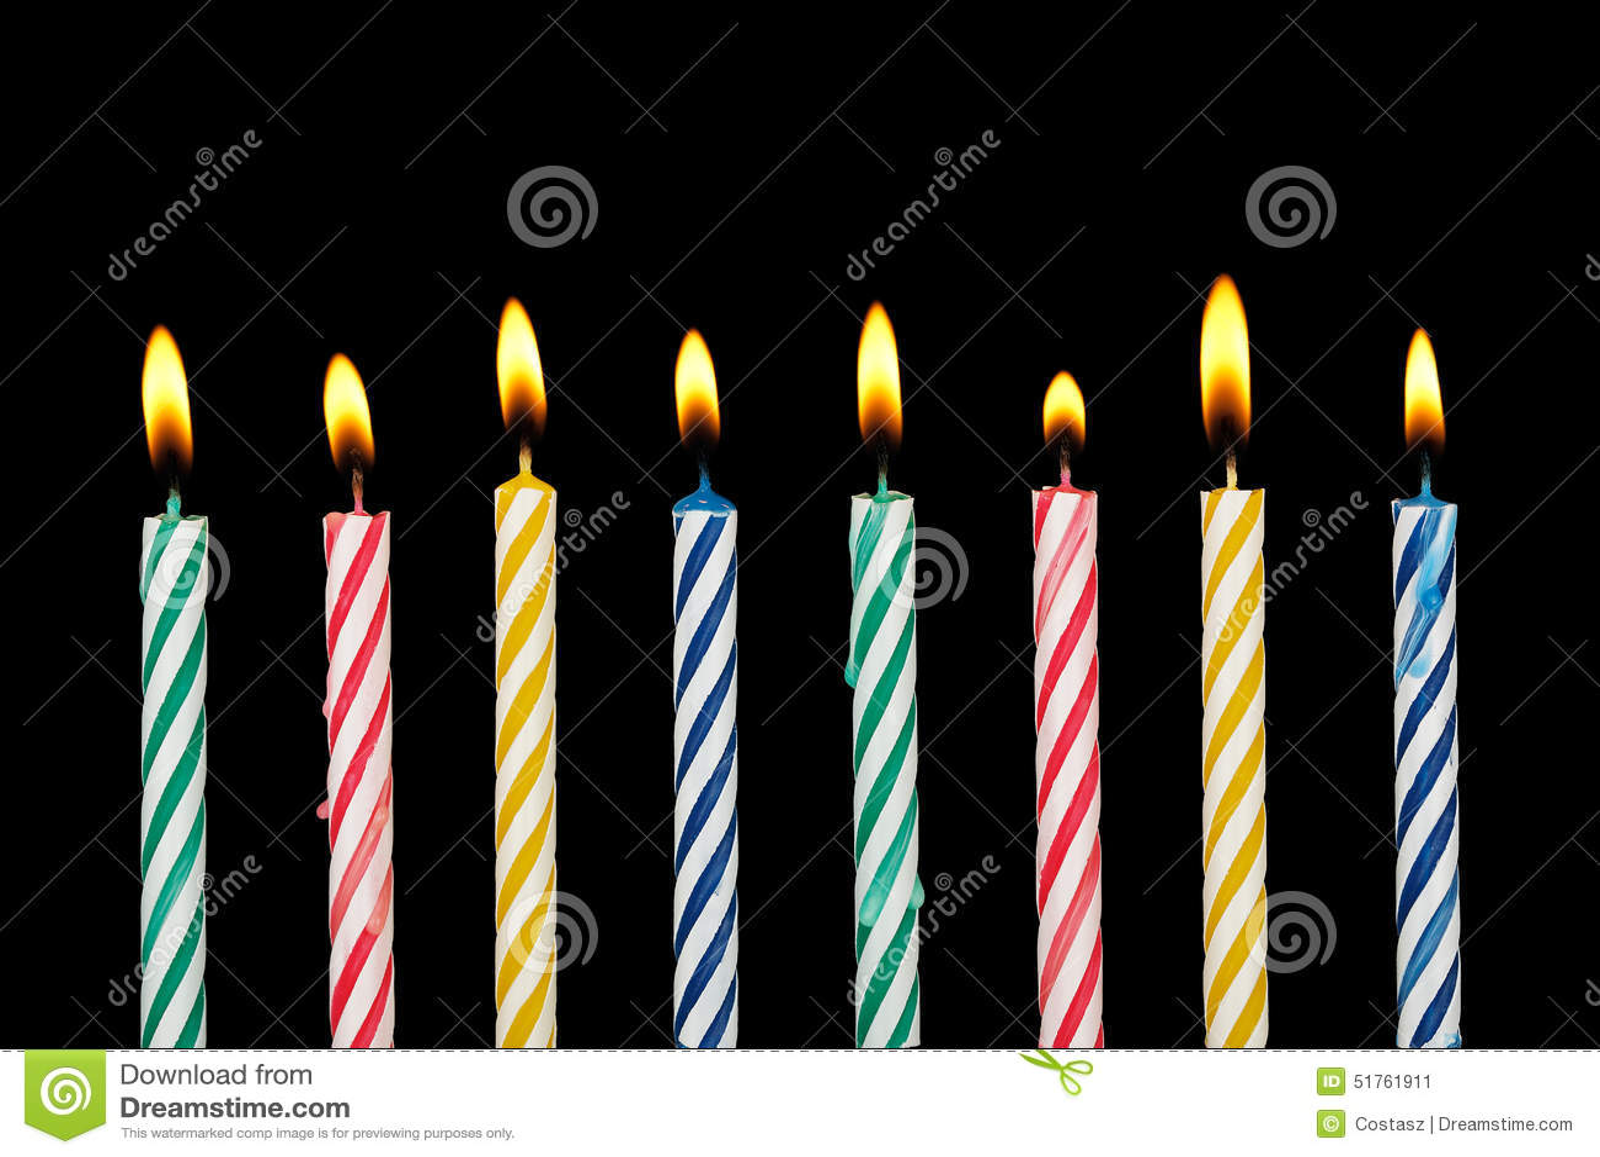 Birthday Candles Stock Photo Image 51761911